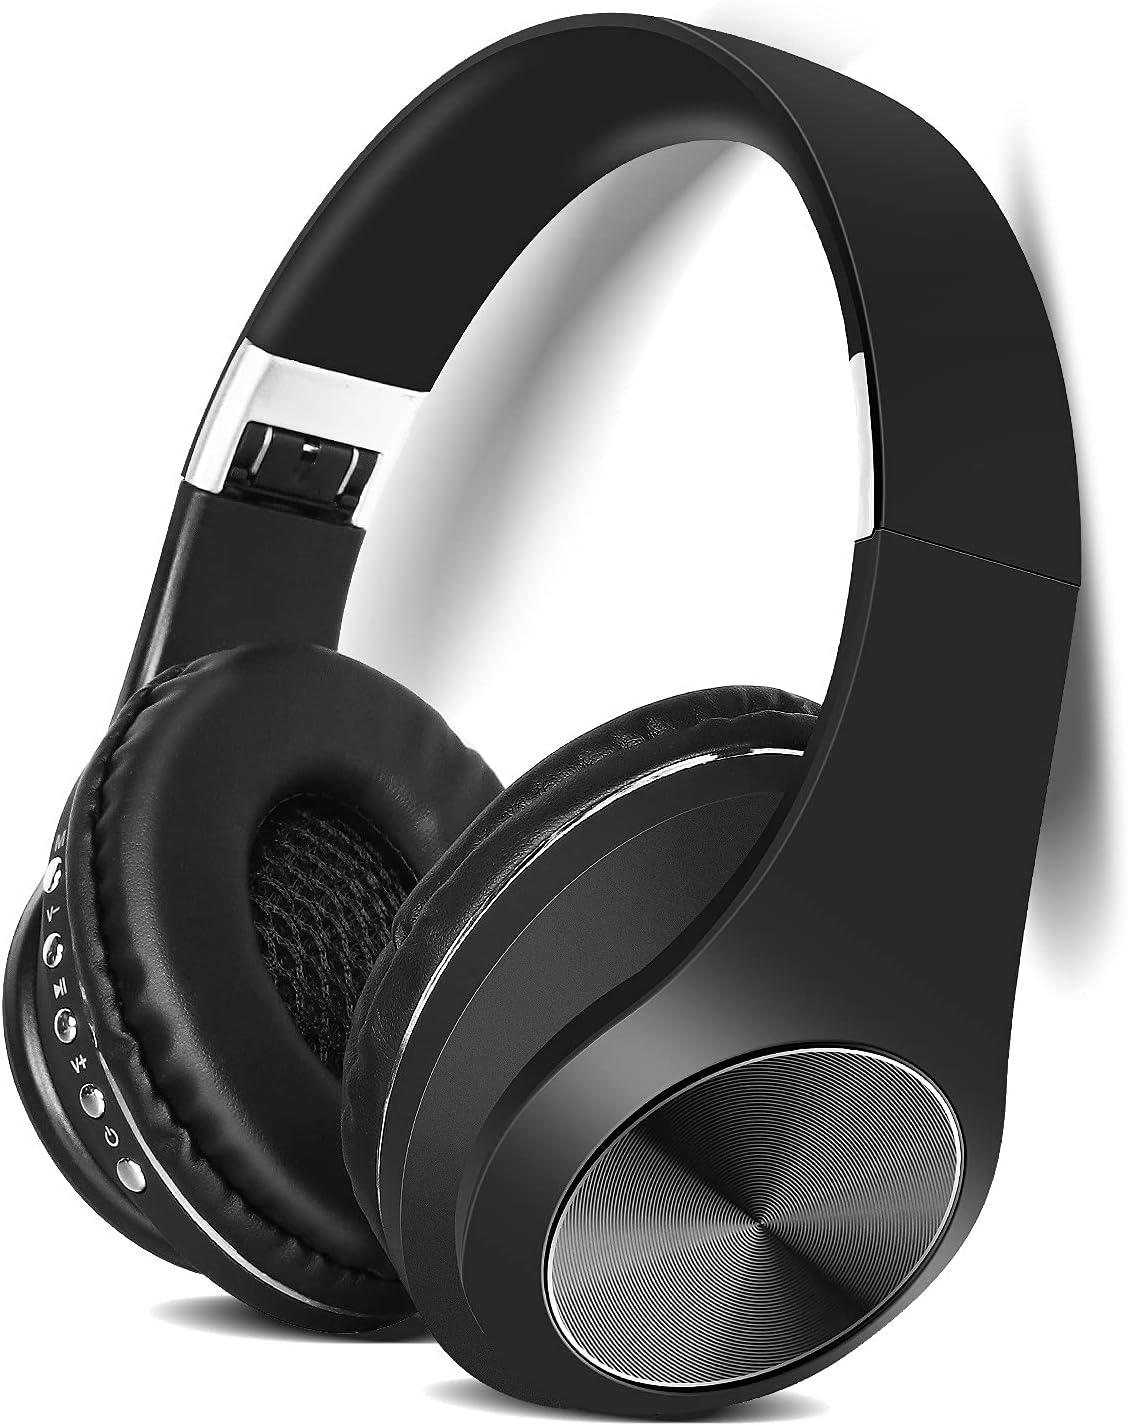 Indefinitely UrbanX UX991 Wireless Deluxe Industry Headphones Overhead with Leading